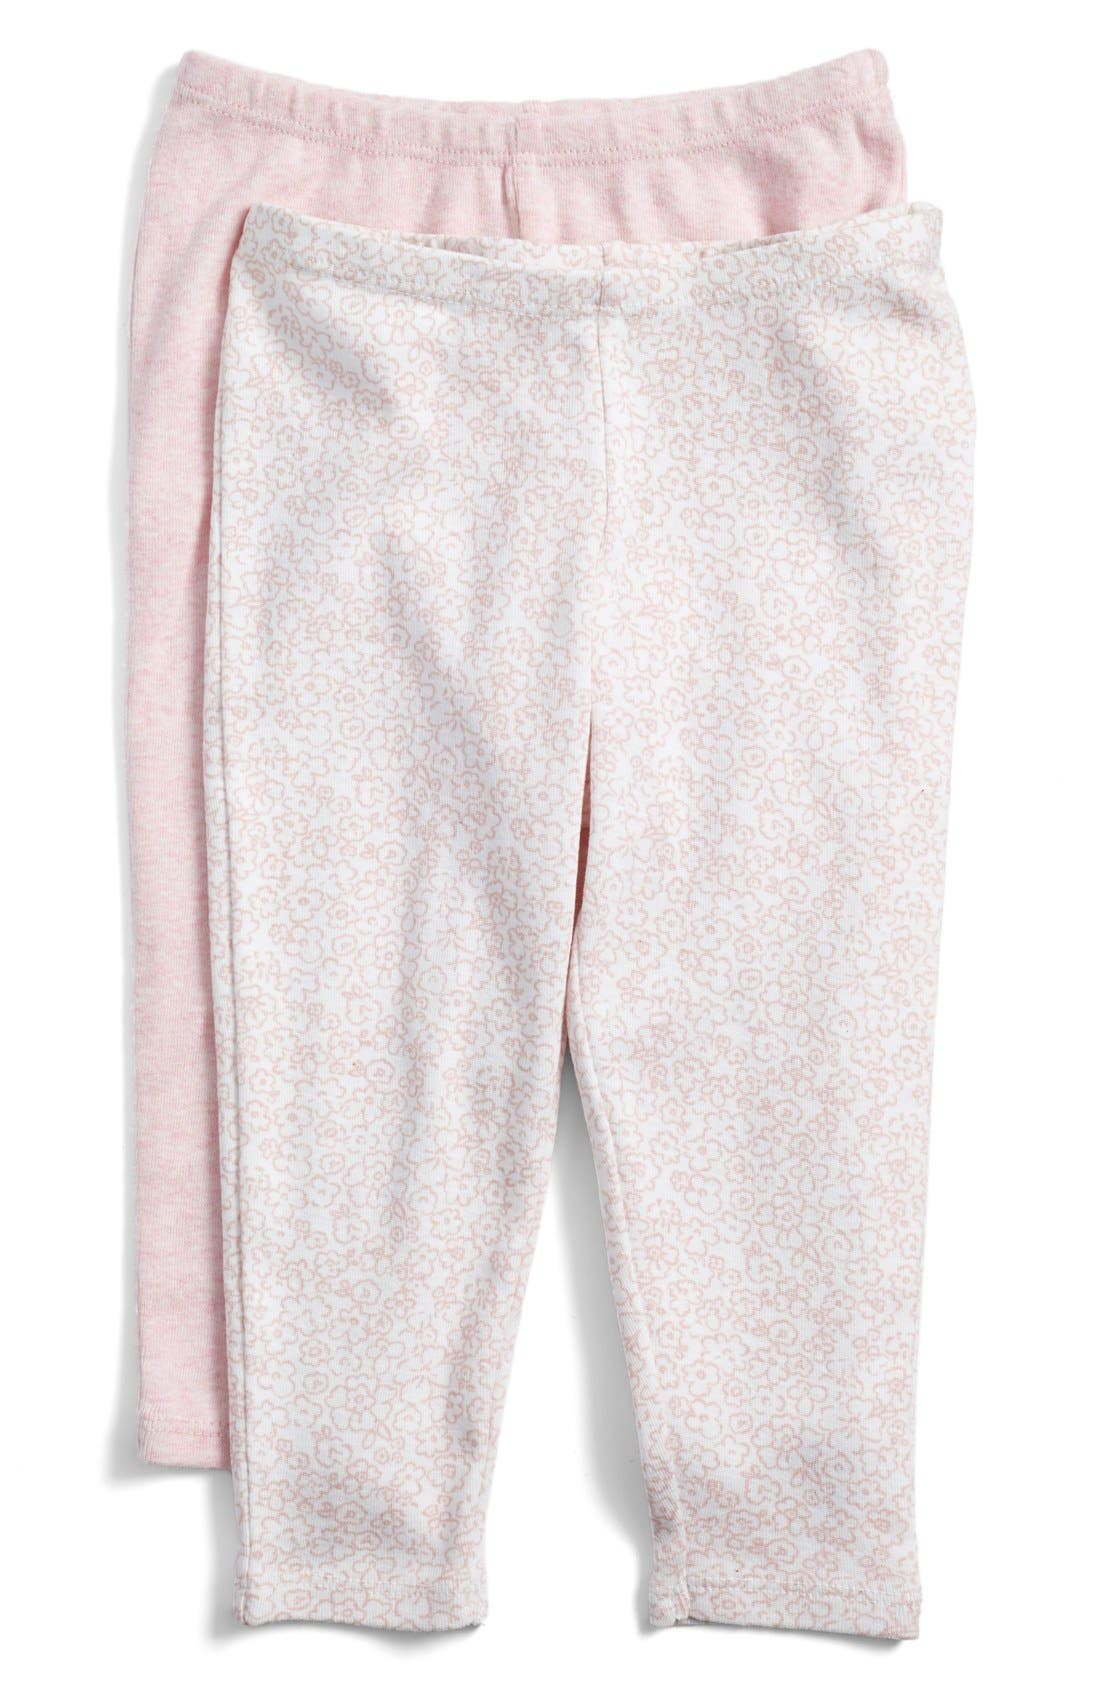 Nordstrom Baby Cotton Leggings (2-Pack) (Baby Girls)